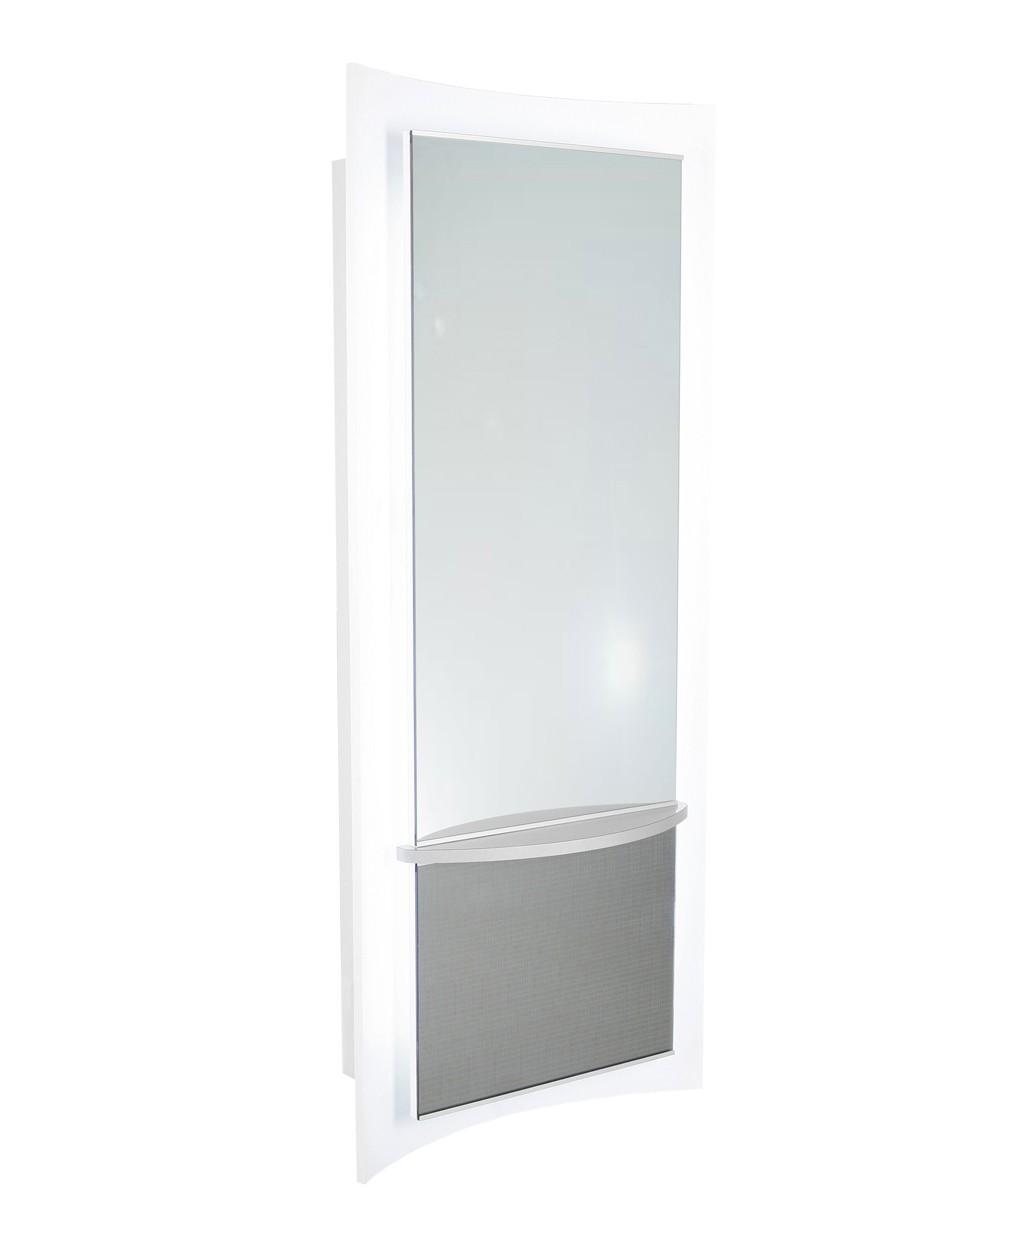 Collins 6601 Kurve Wall-Mounted Mirror